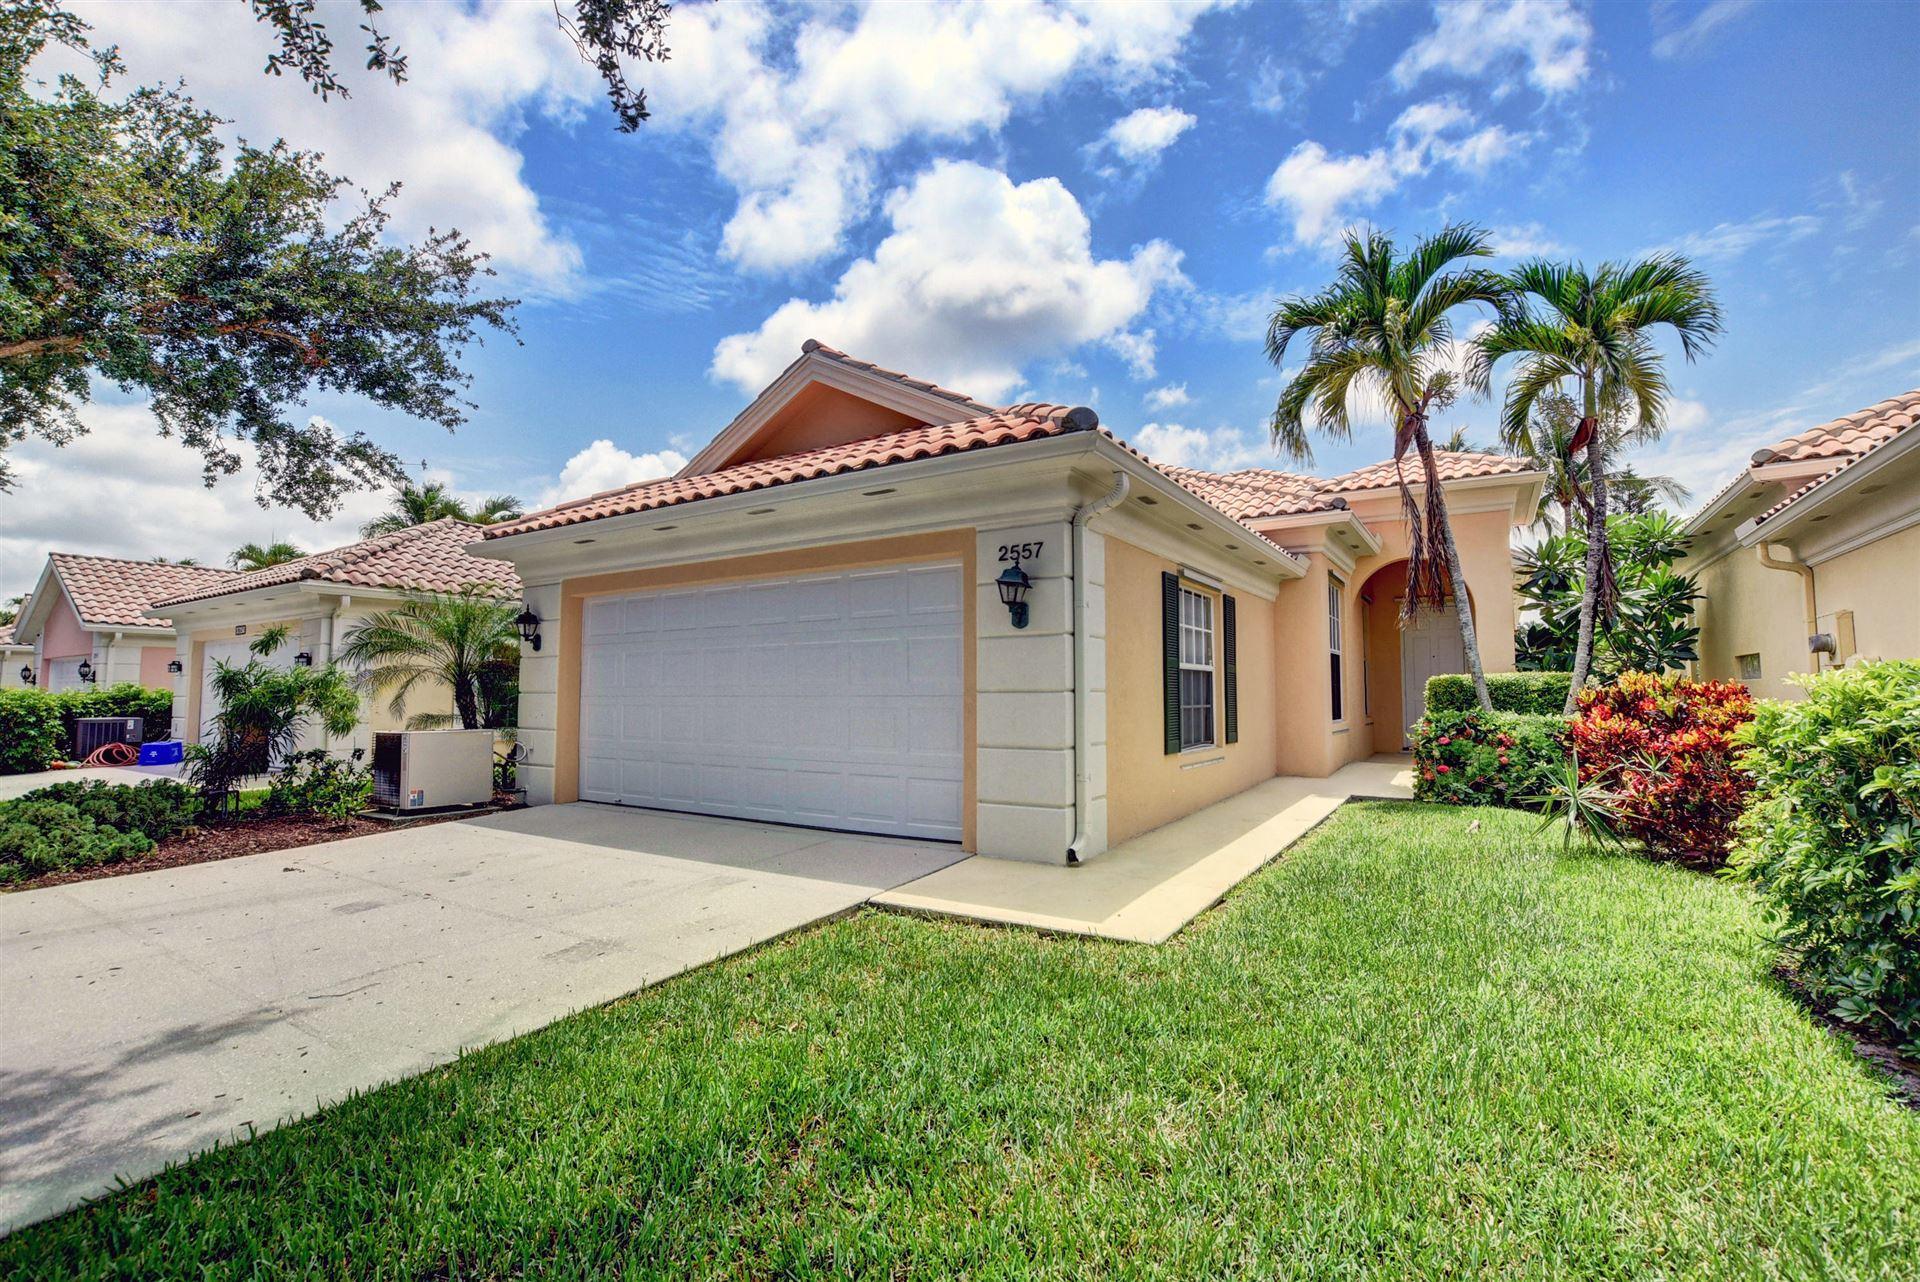 2557 James River Road, West Palm Beach, FL 33411 - MLS#: RX-10732263